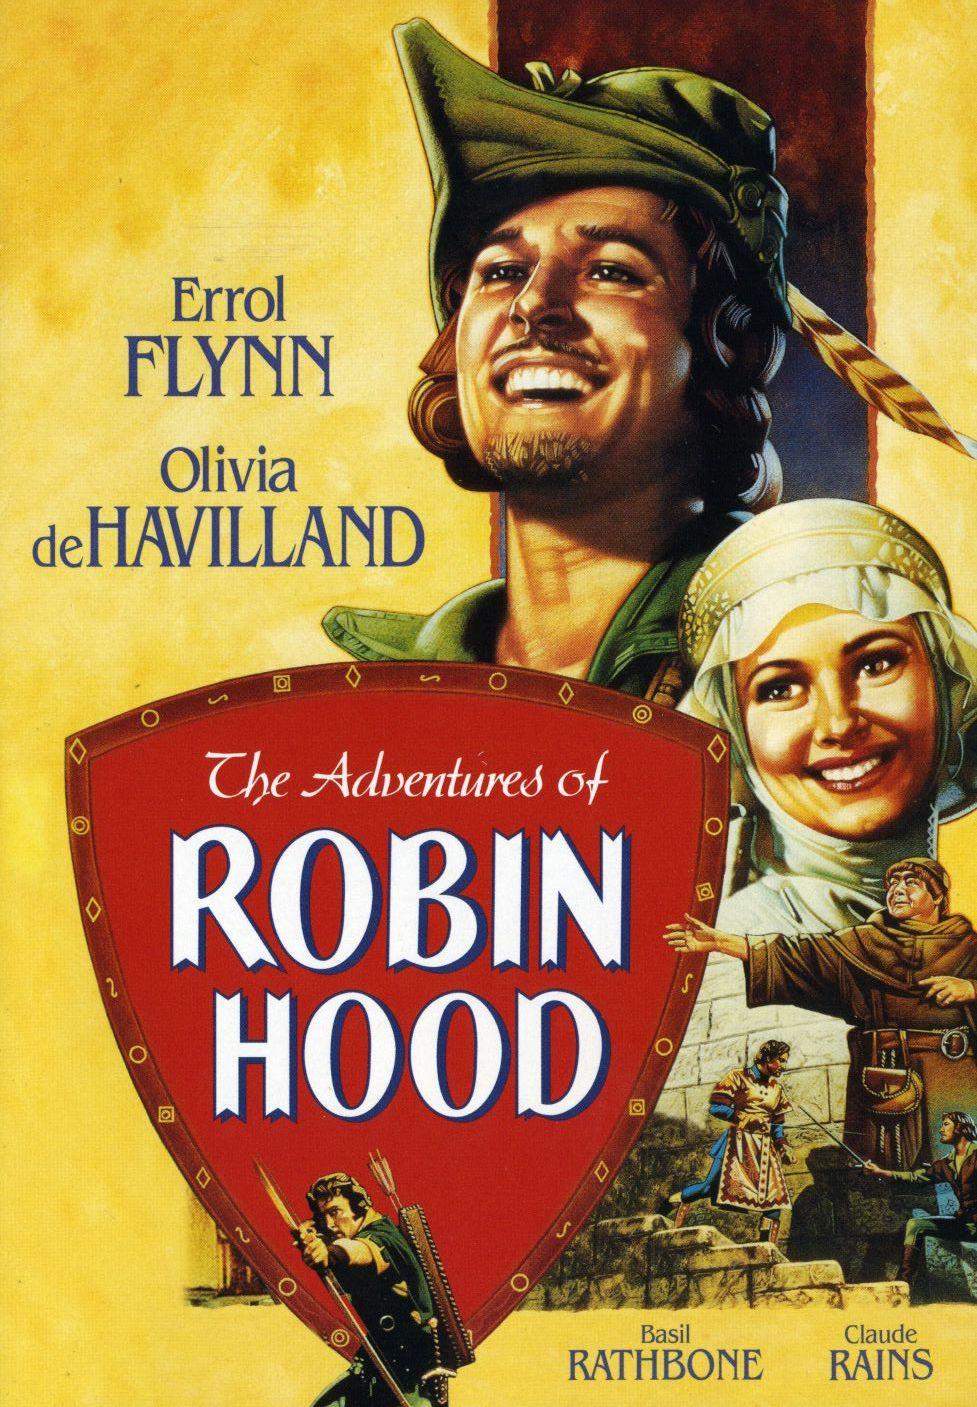 The Adventures of Robin Hood (DVD)